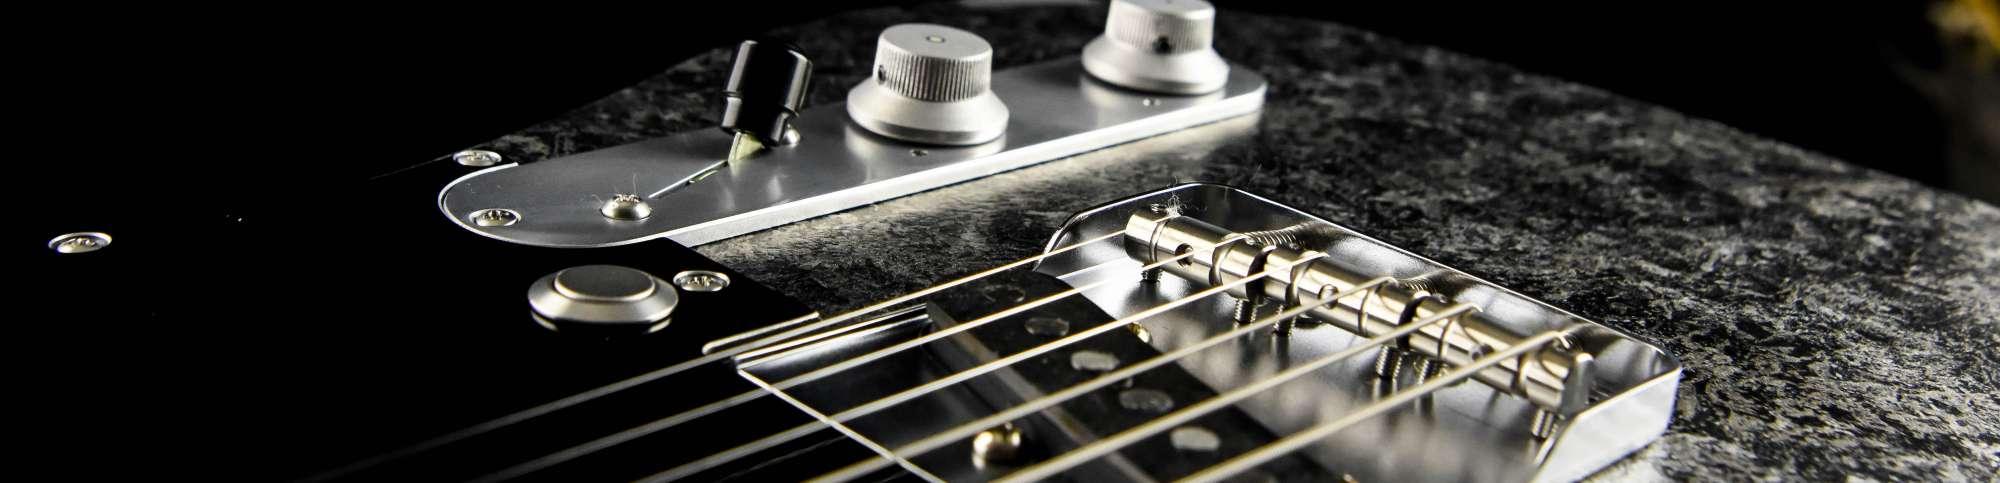 Versatile T-Style Custom Guitar - cyanguitars.com